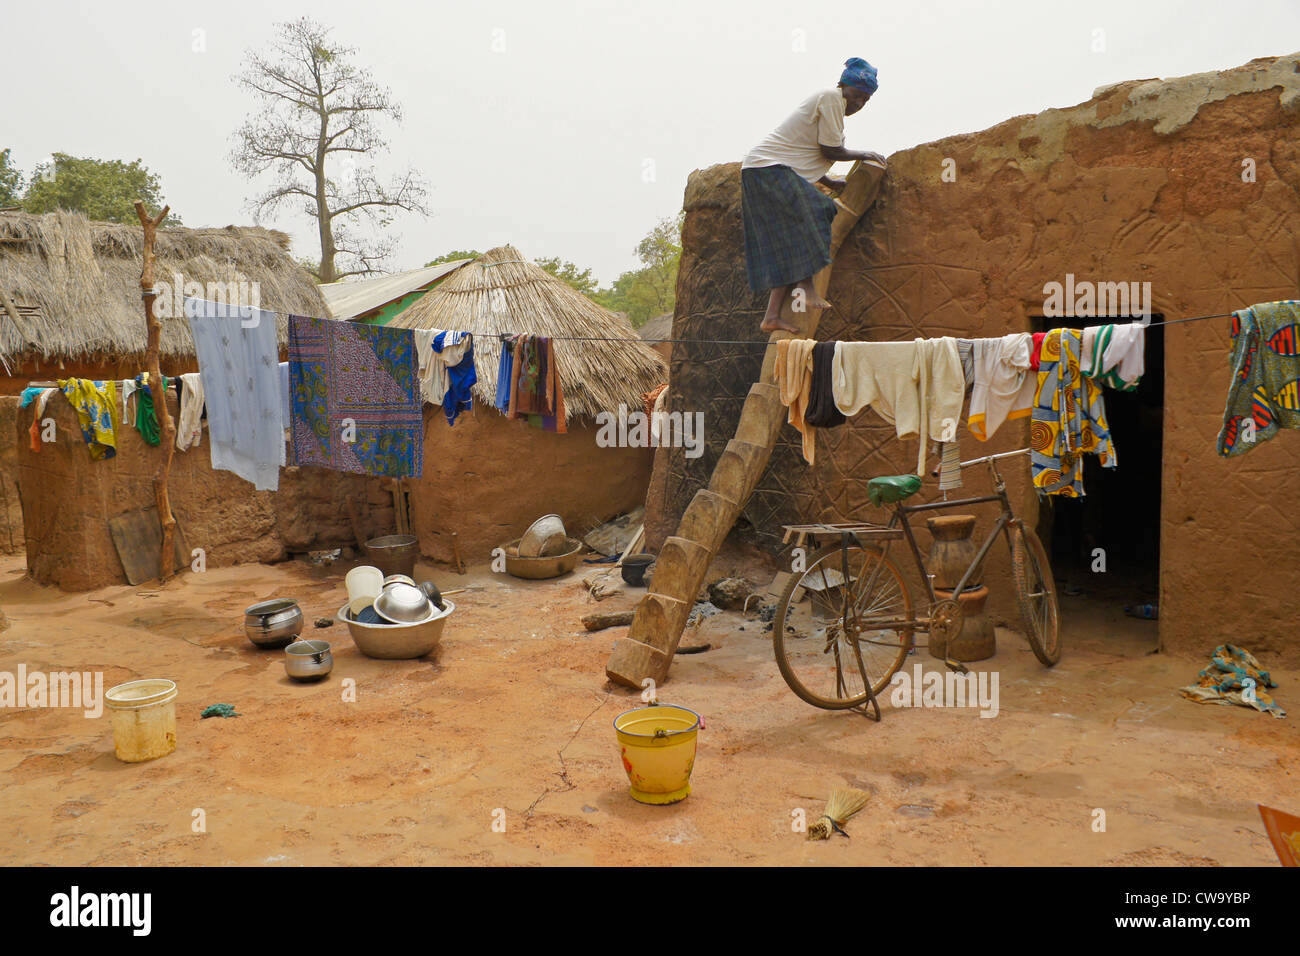 Woman on log ladder in family compound, Mognori Eco-Village, Ghana - Stock Image